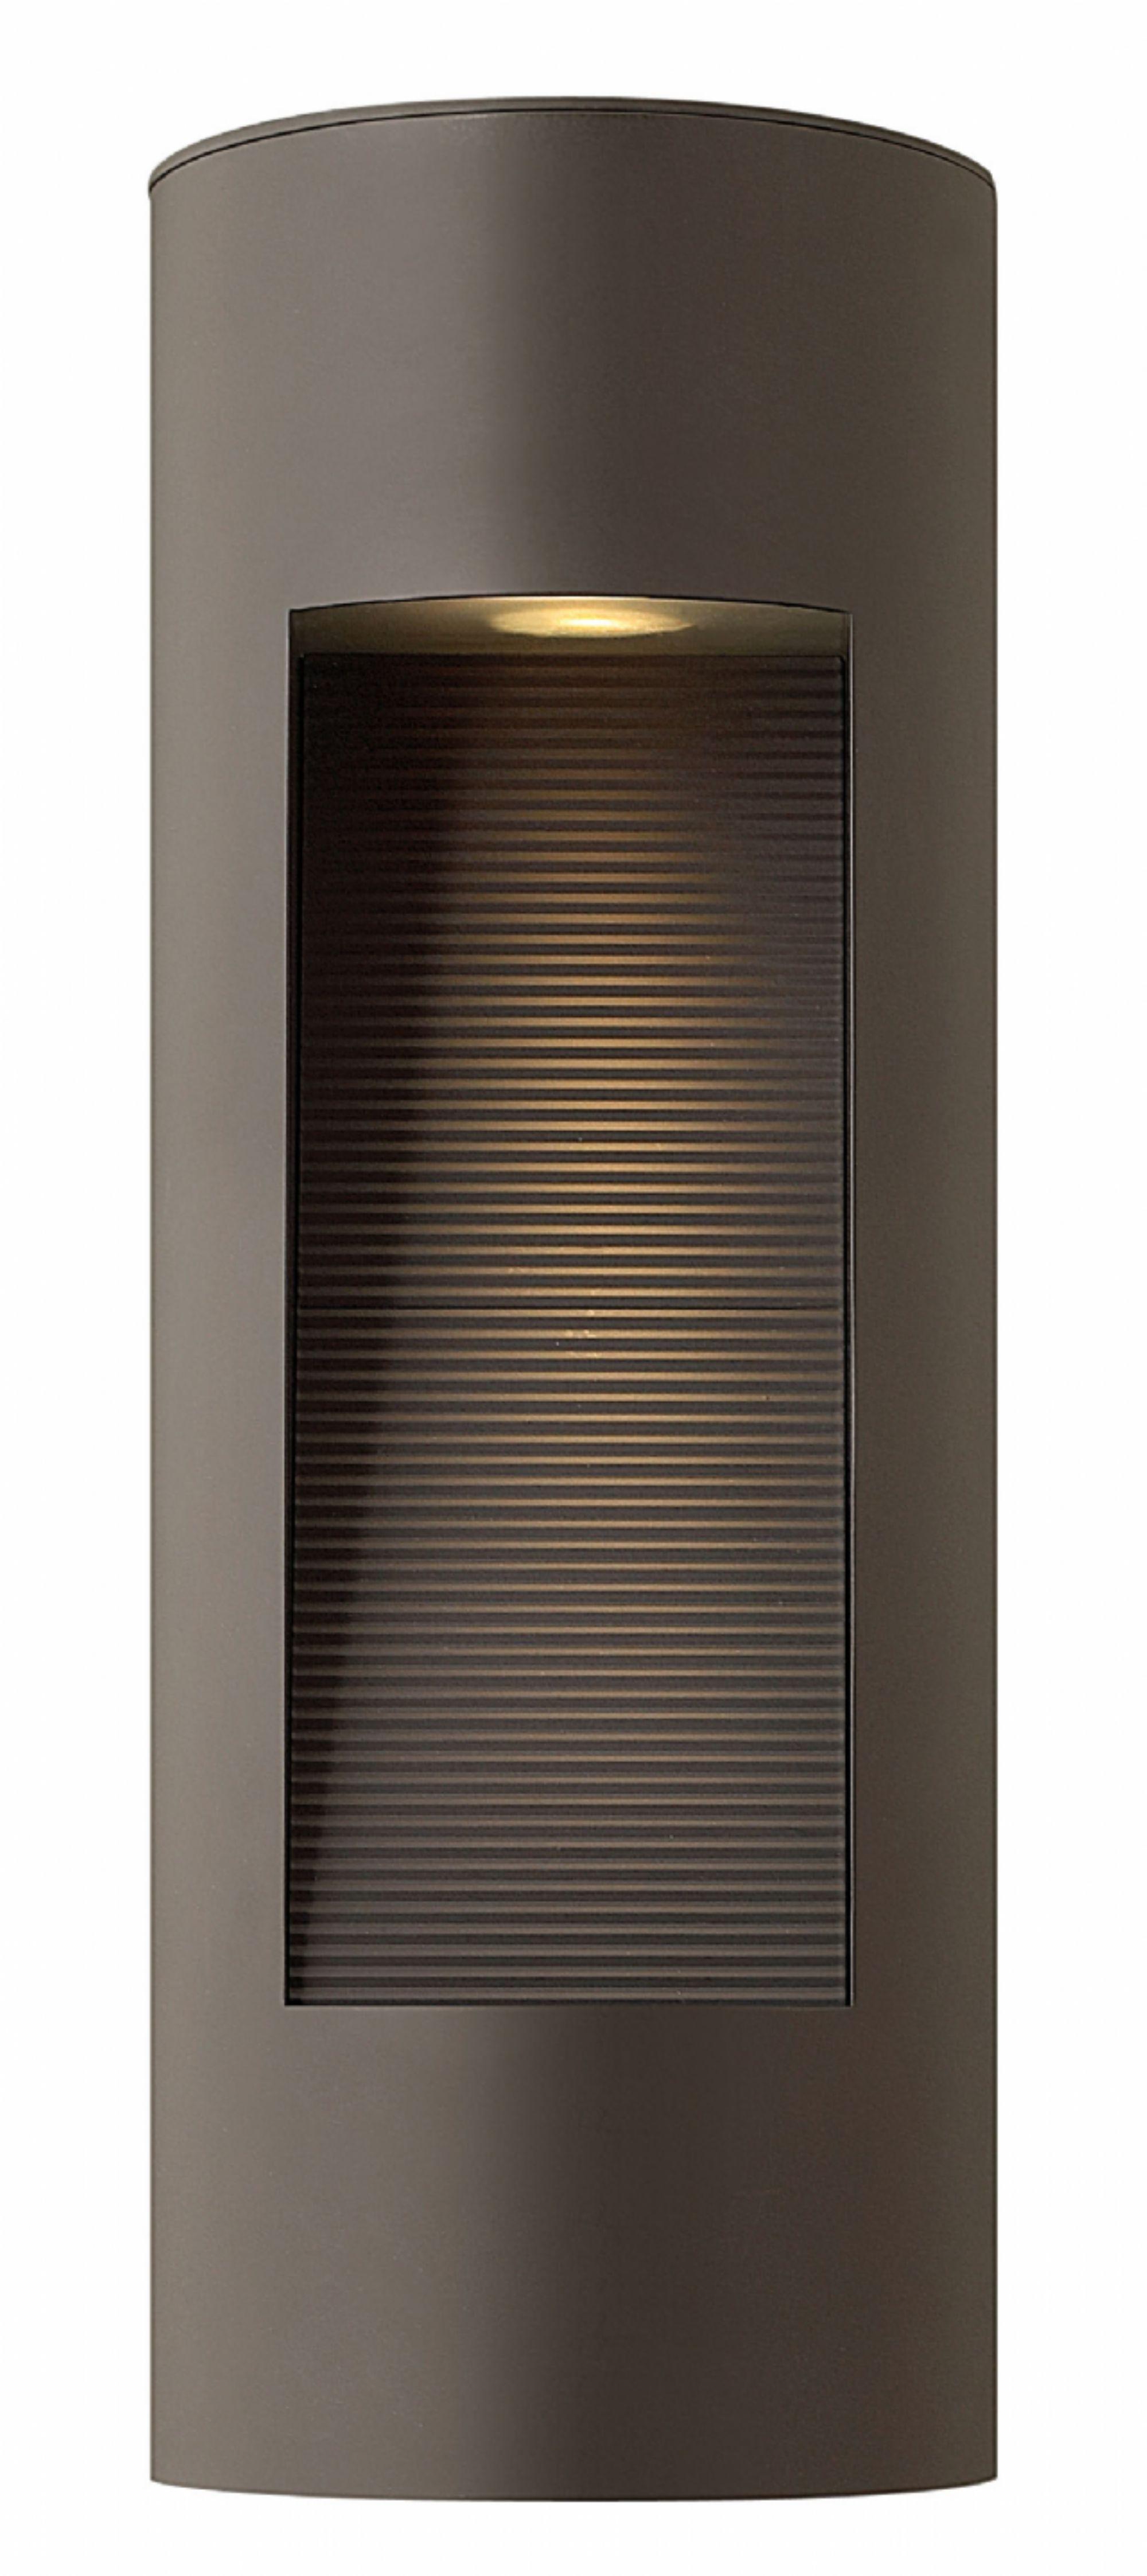 Bronze Luna > Exterior Wall Mount Pertaining To Modern Outdoor Hinkley Lighting (#3 of 15)